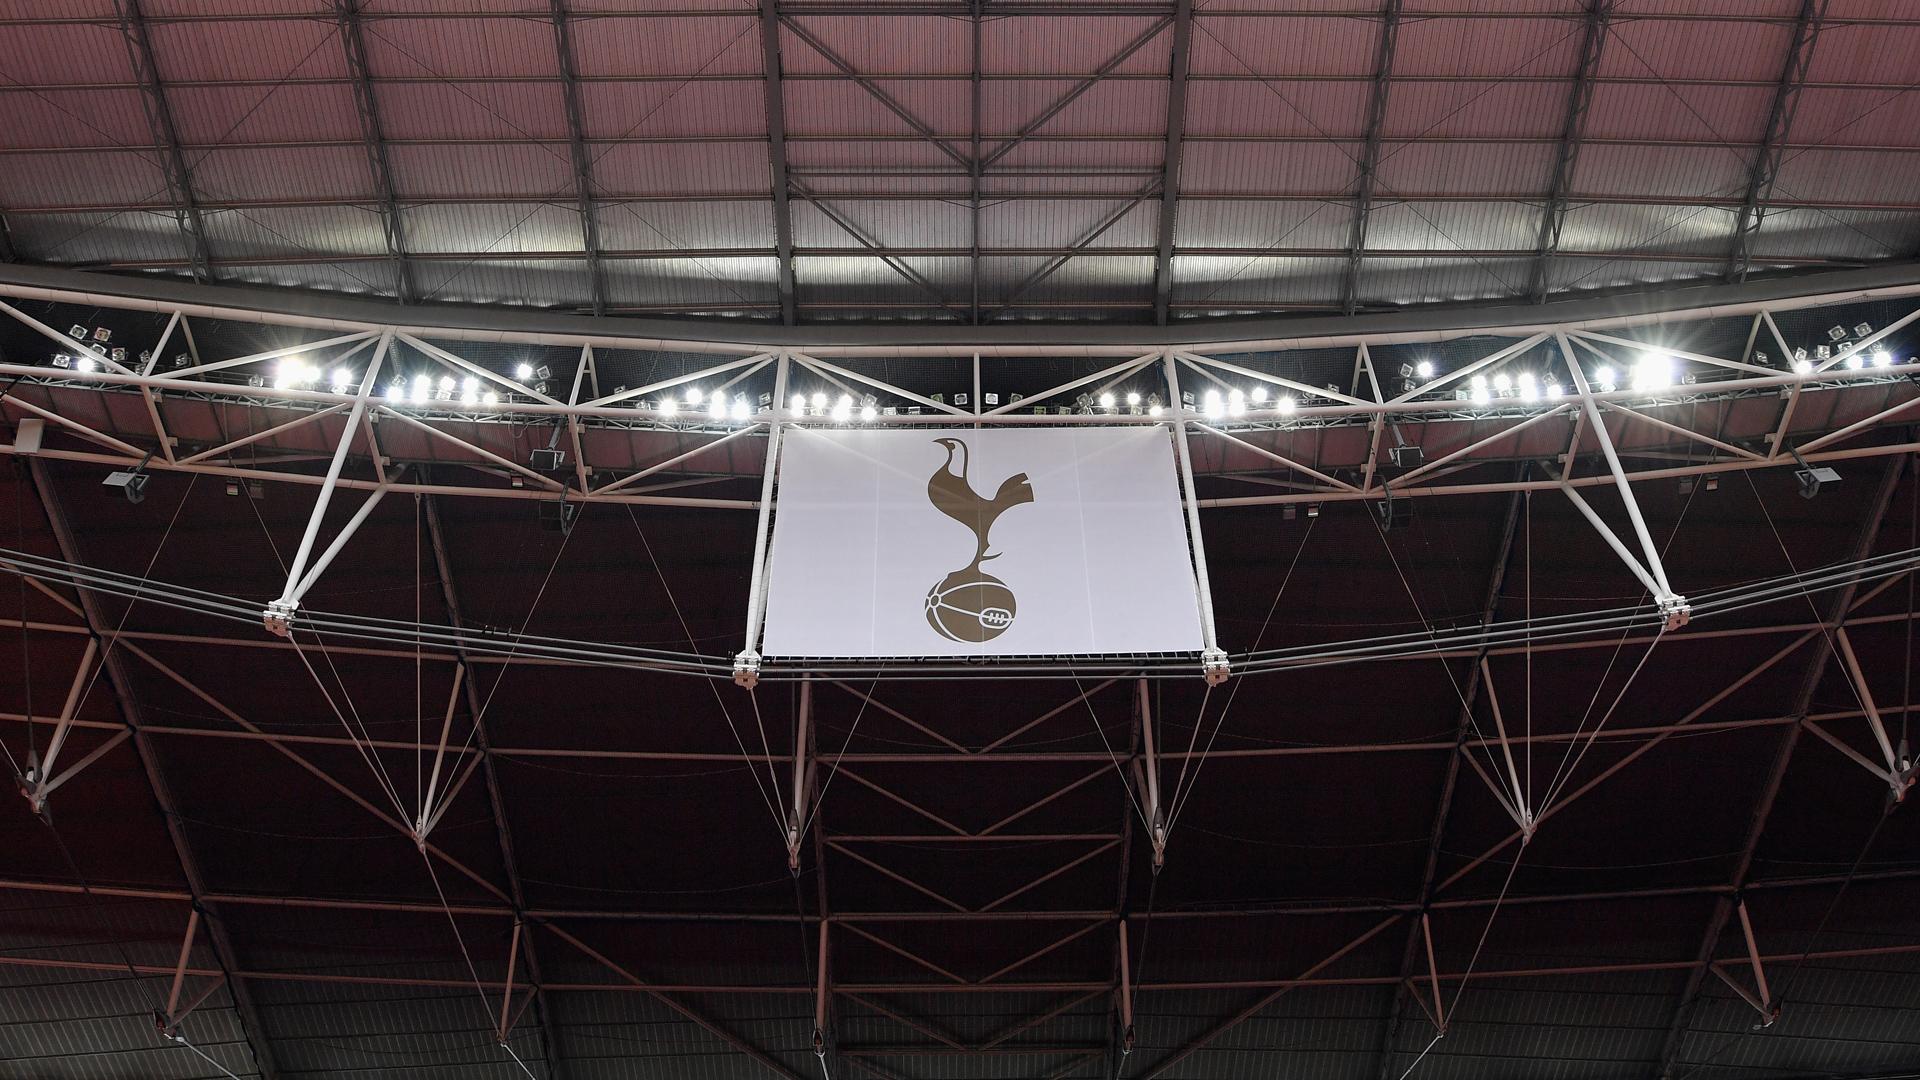 Tottenham Hotspur Wembley Stadium 20102017